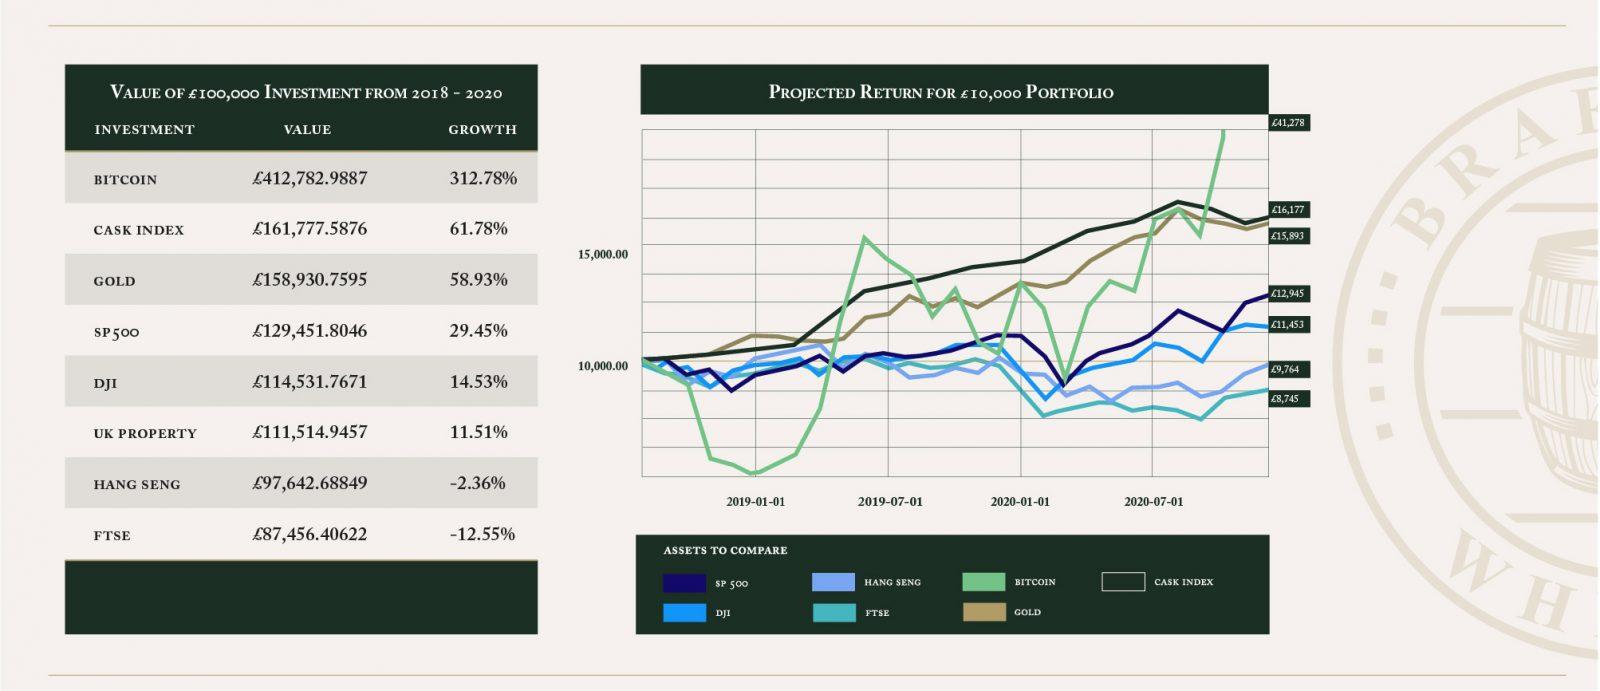 Whisky_Cask_Investment_Data